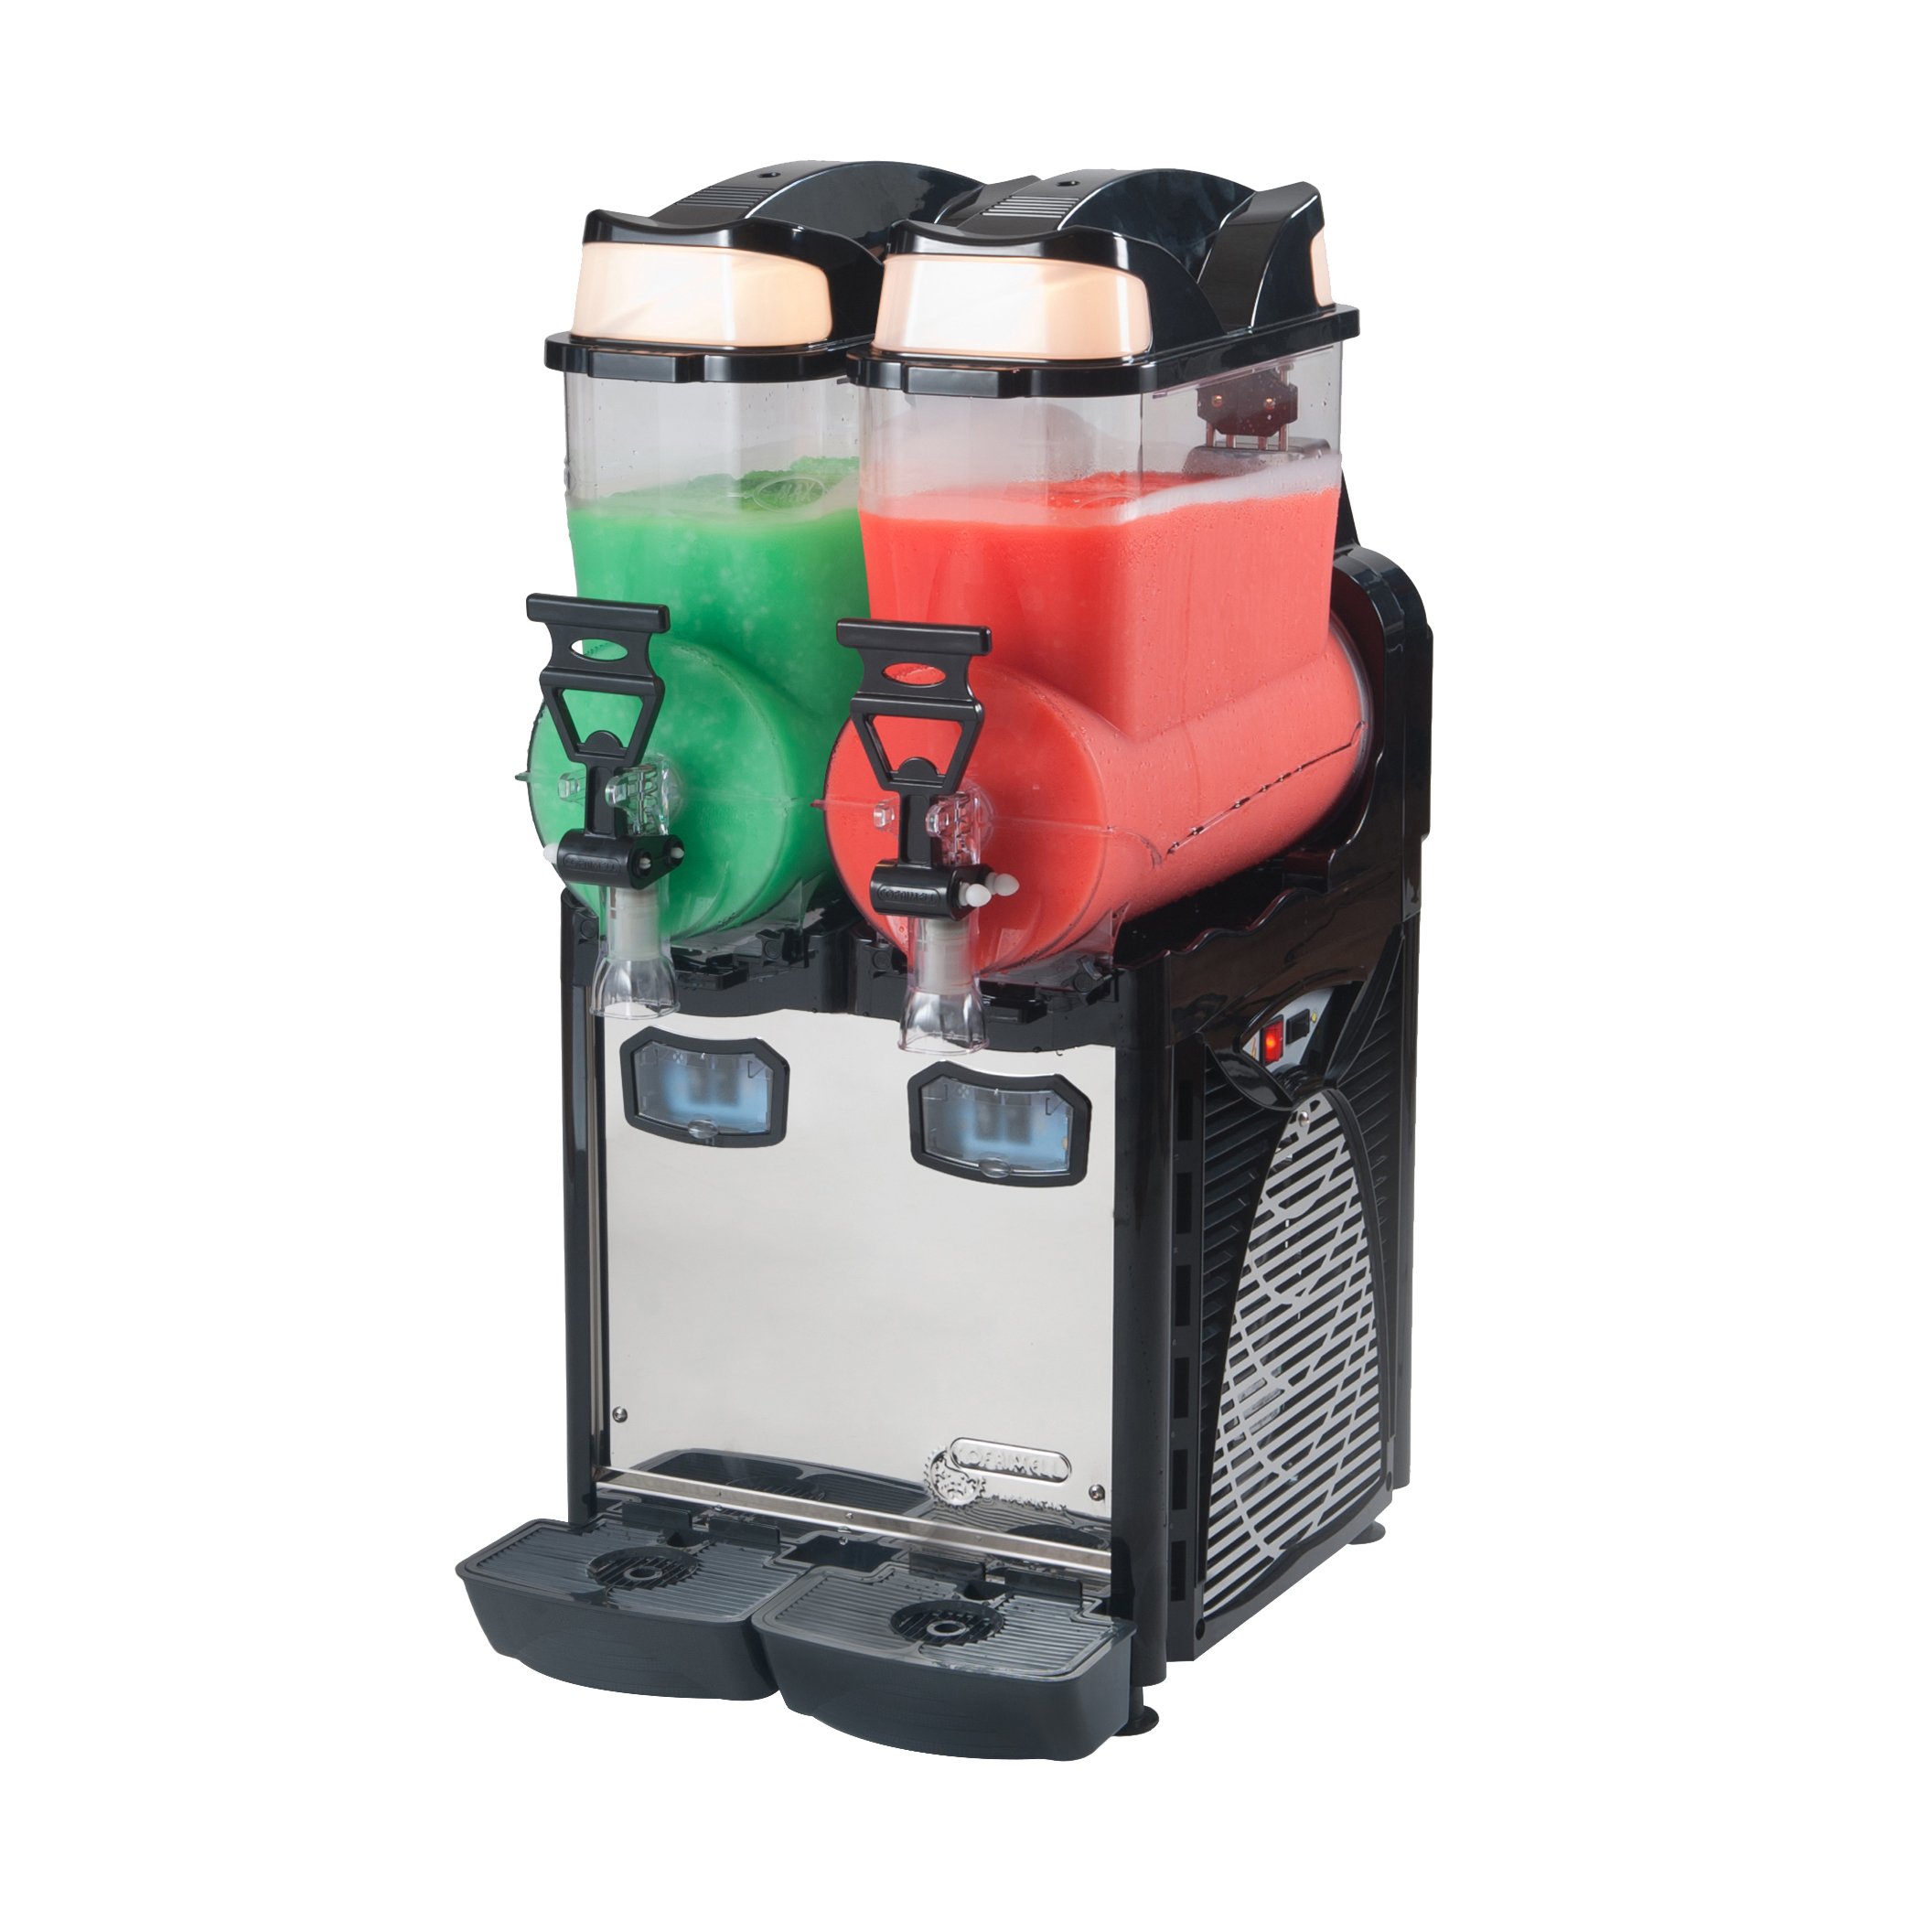 Eurodib USA OASIS2 juice & slush machines